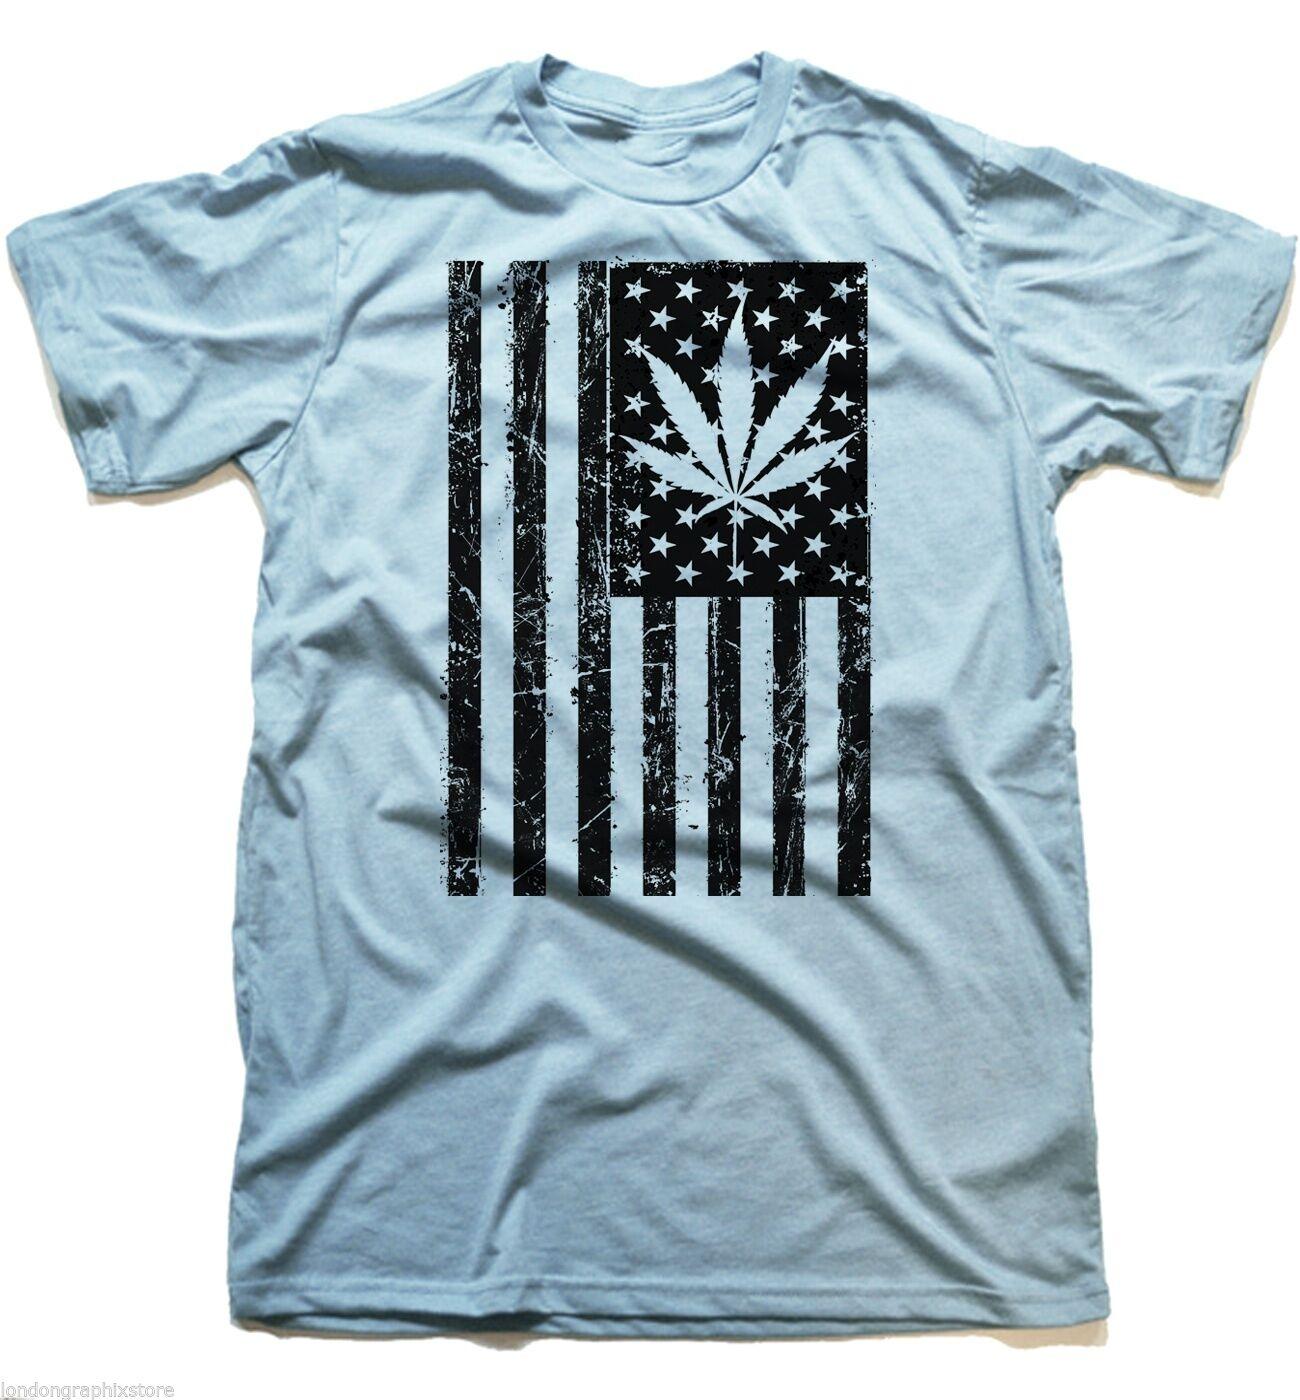 Marijuana T-Shirt, Weed , Cannabis, 420, blunt, bong, drugs men swag US flag 1